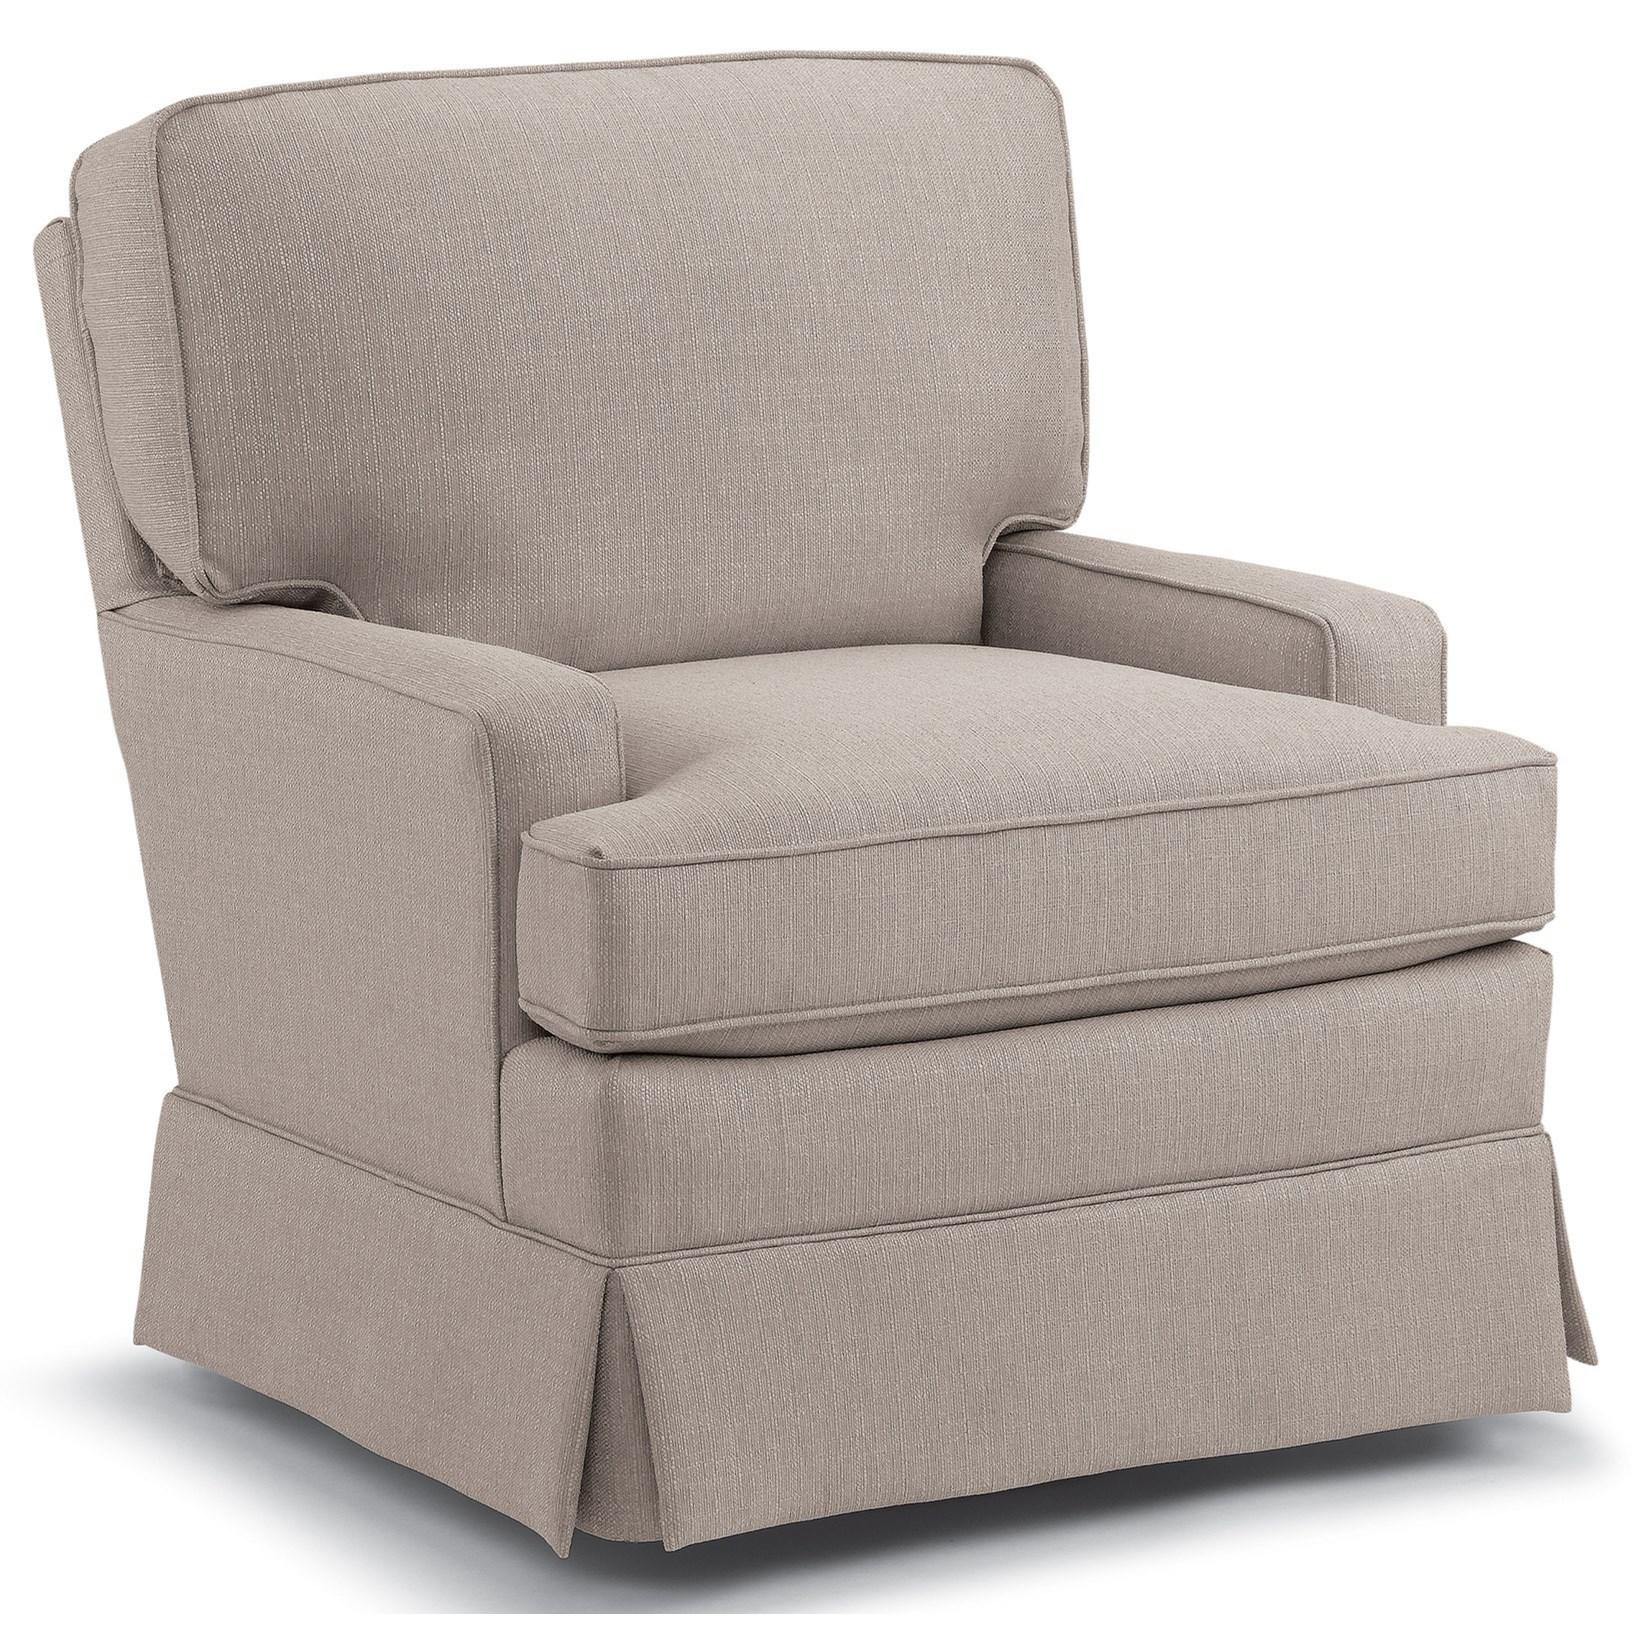 Swivels Rena Swivel Glider by Best Home Furnishings at Walker's Furniture